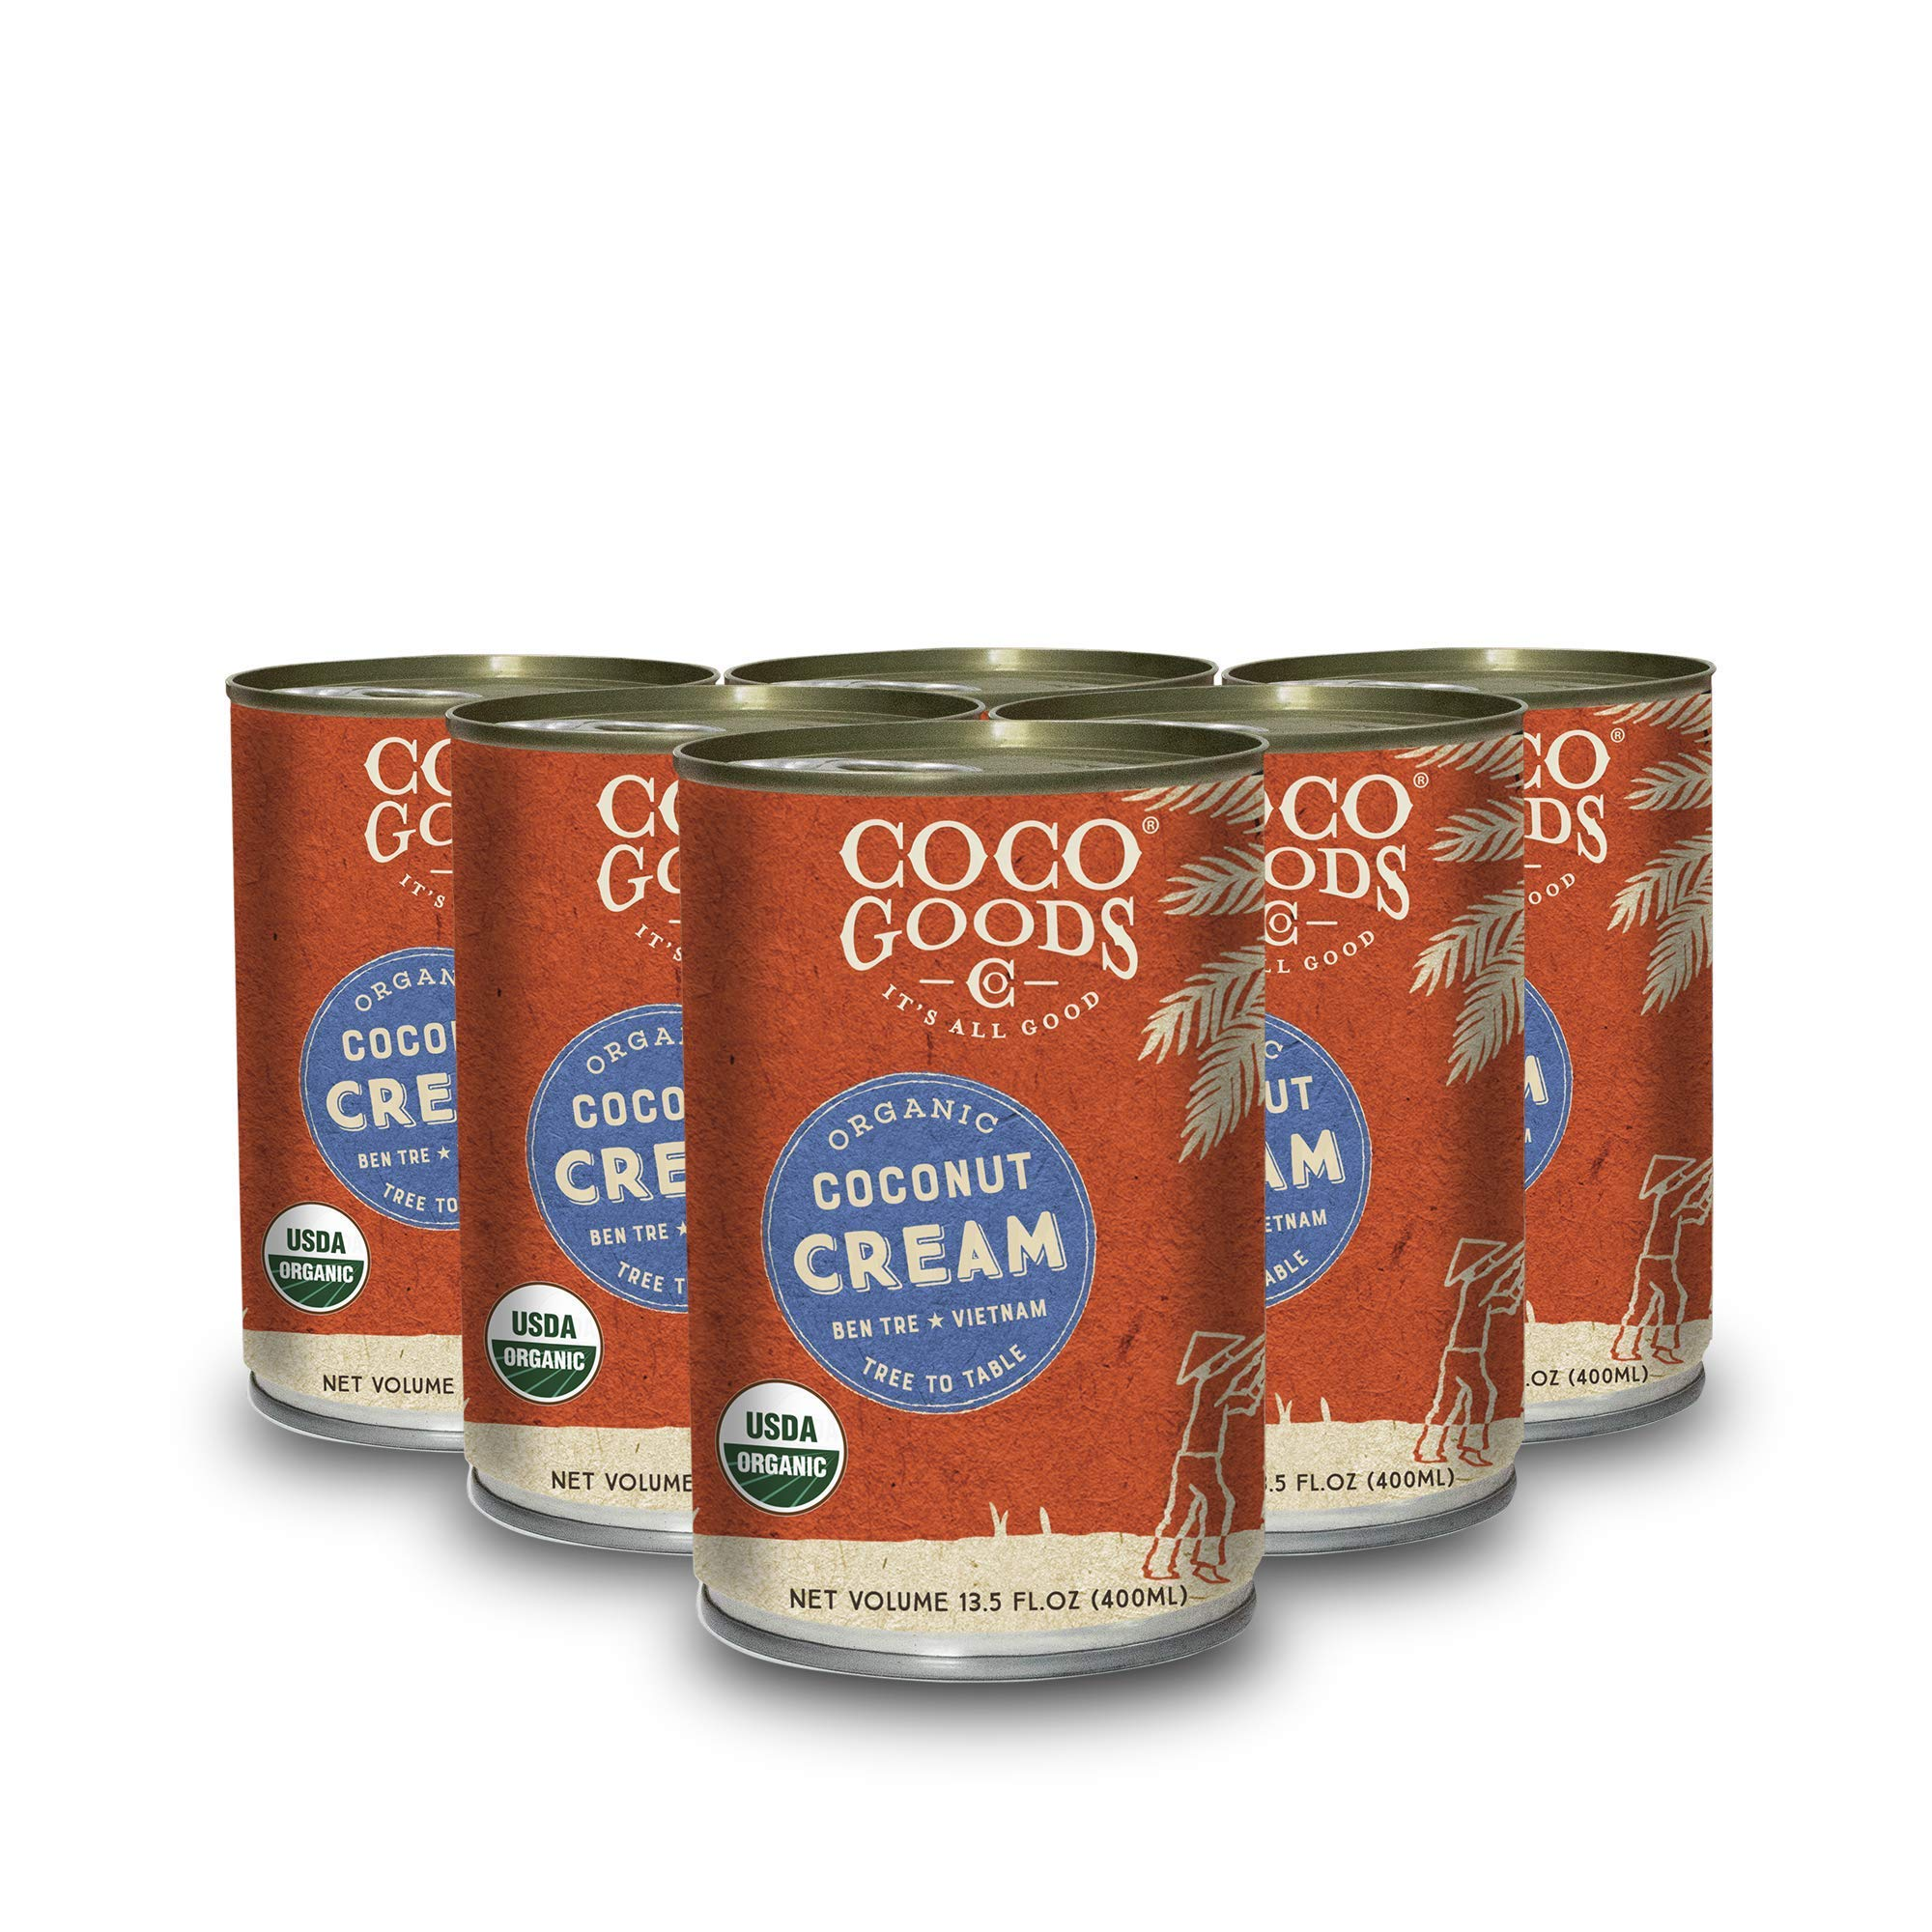 CocoGoods Co. Vietnam Single-Origin Organic Coconut Cream 13.5 oz - Gluten-free, Non-GMO, Vegan, & Dairy-free (Pack of 6) by COCOGOODSCO (Image #1)